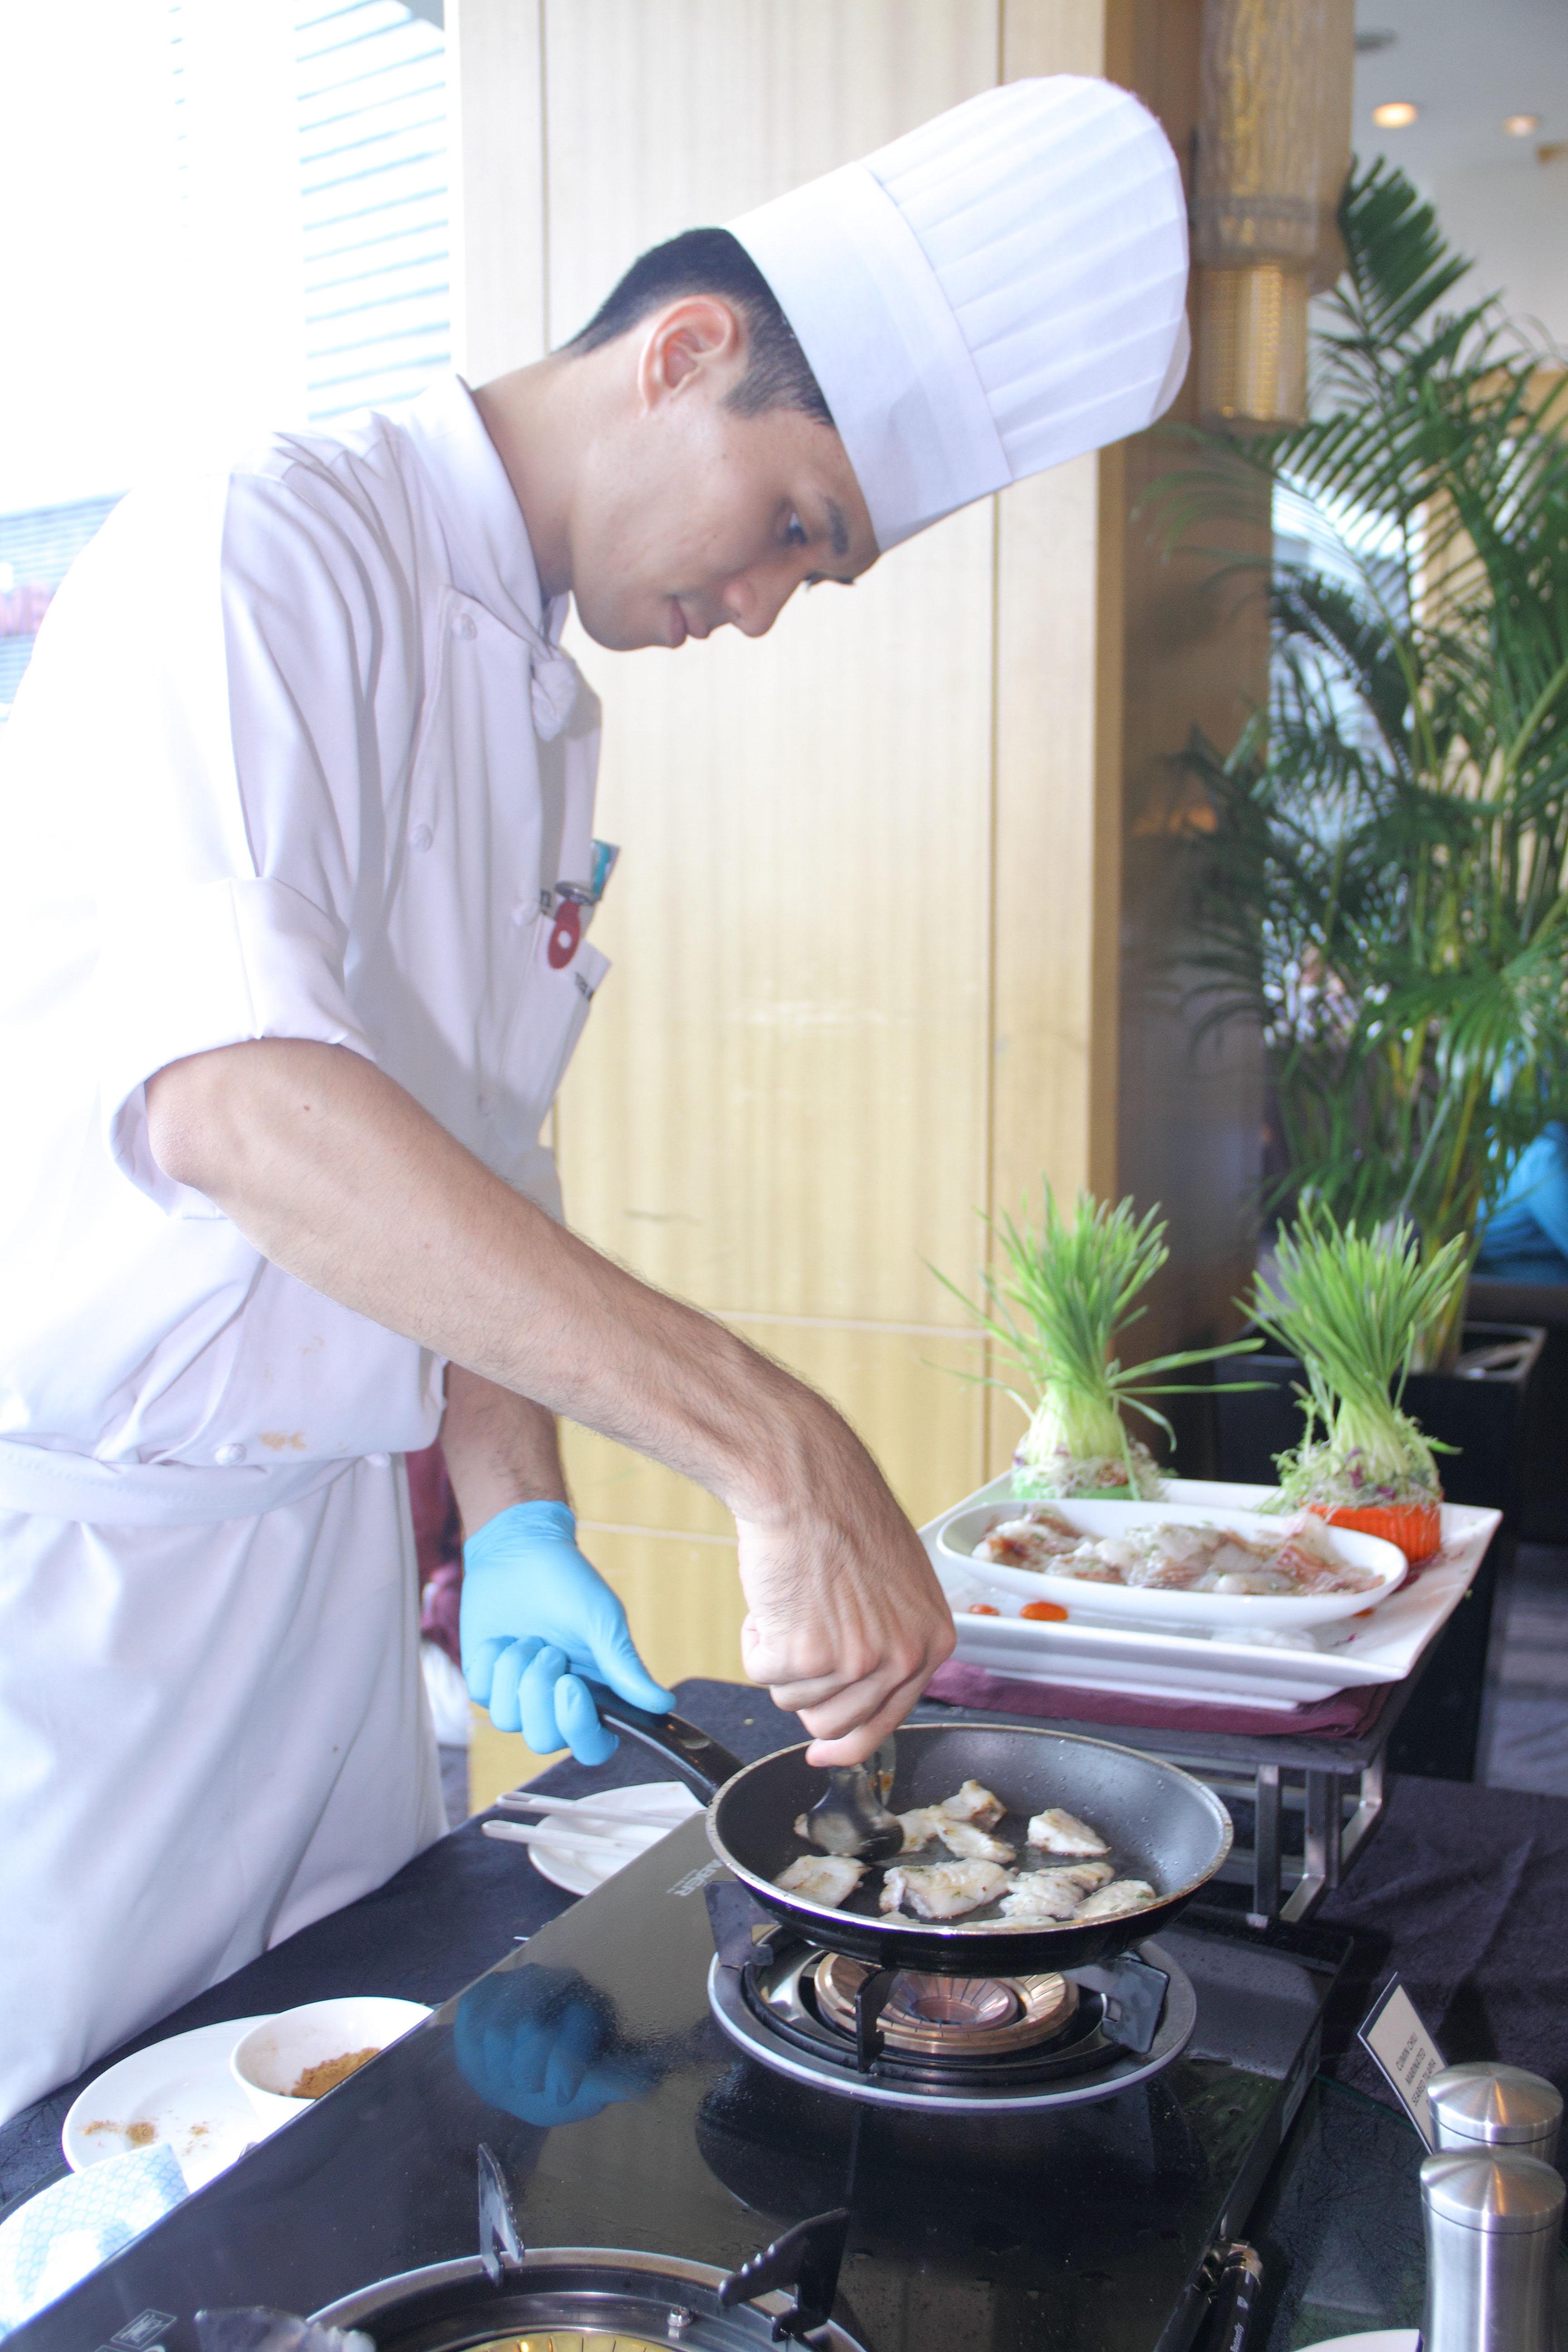 Malaysia Aims to Transform Seafood Markets Towards Sustainability